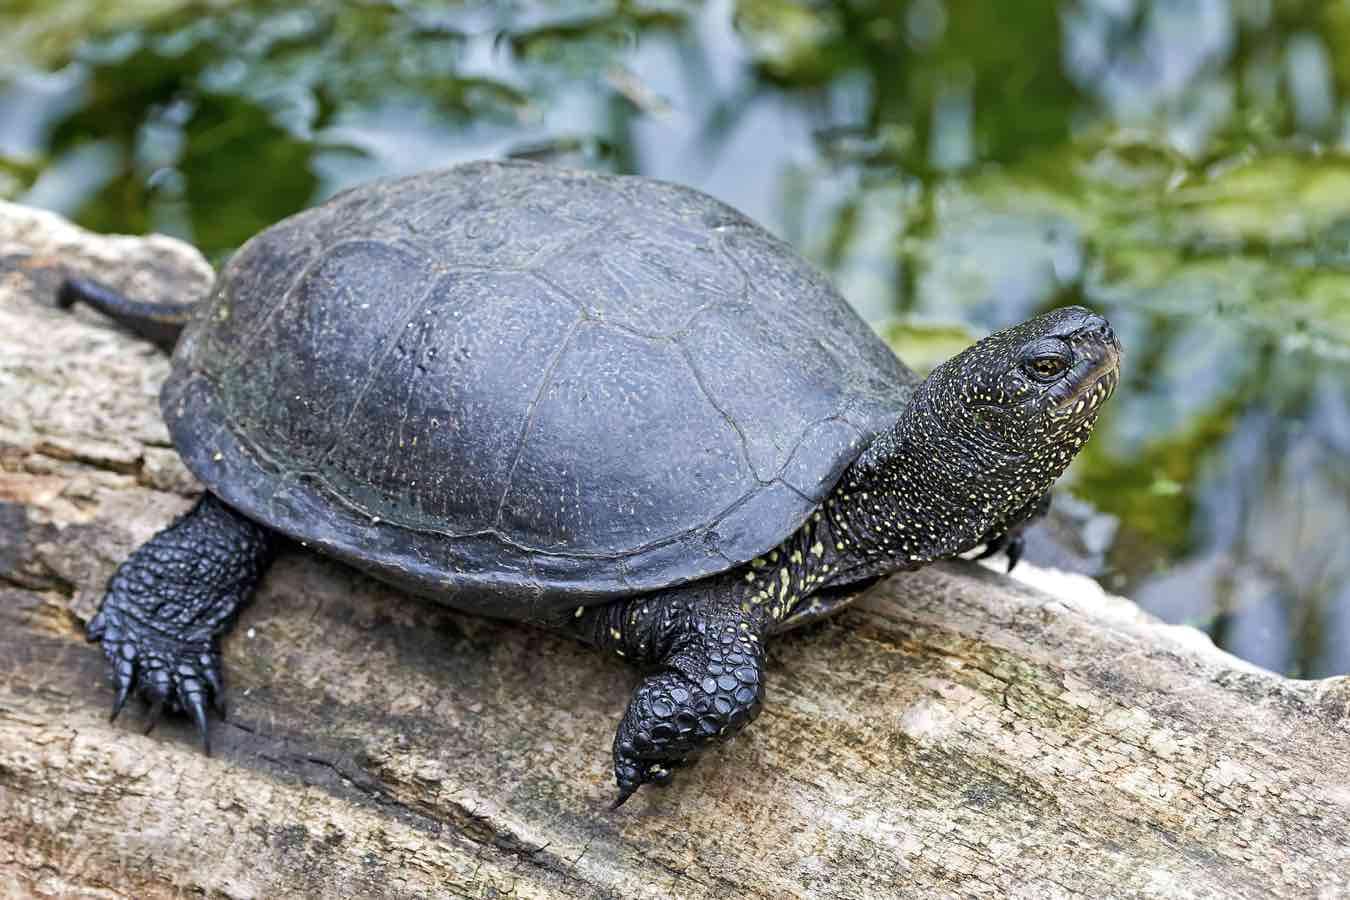 European pond turtle resting in its natural habitat